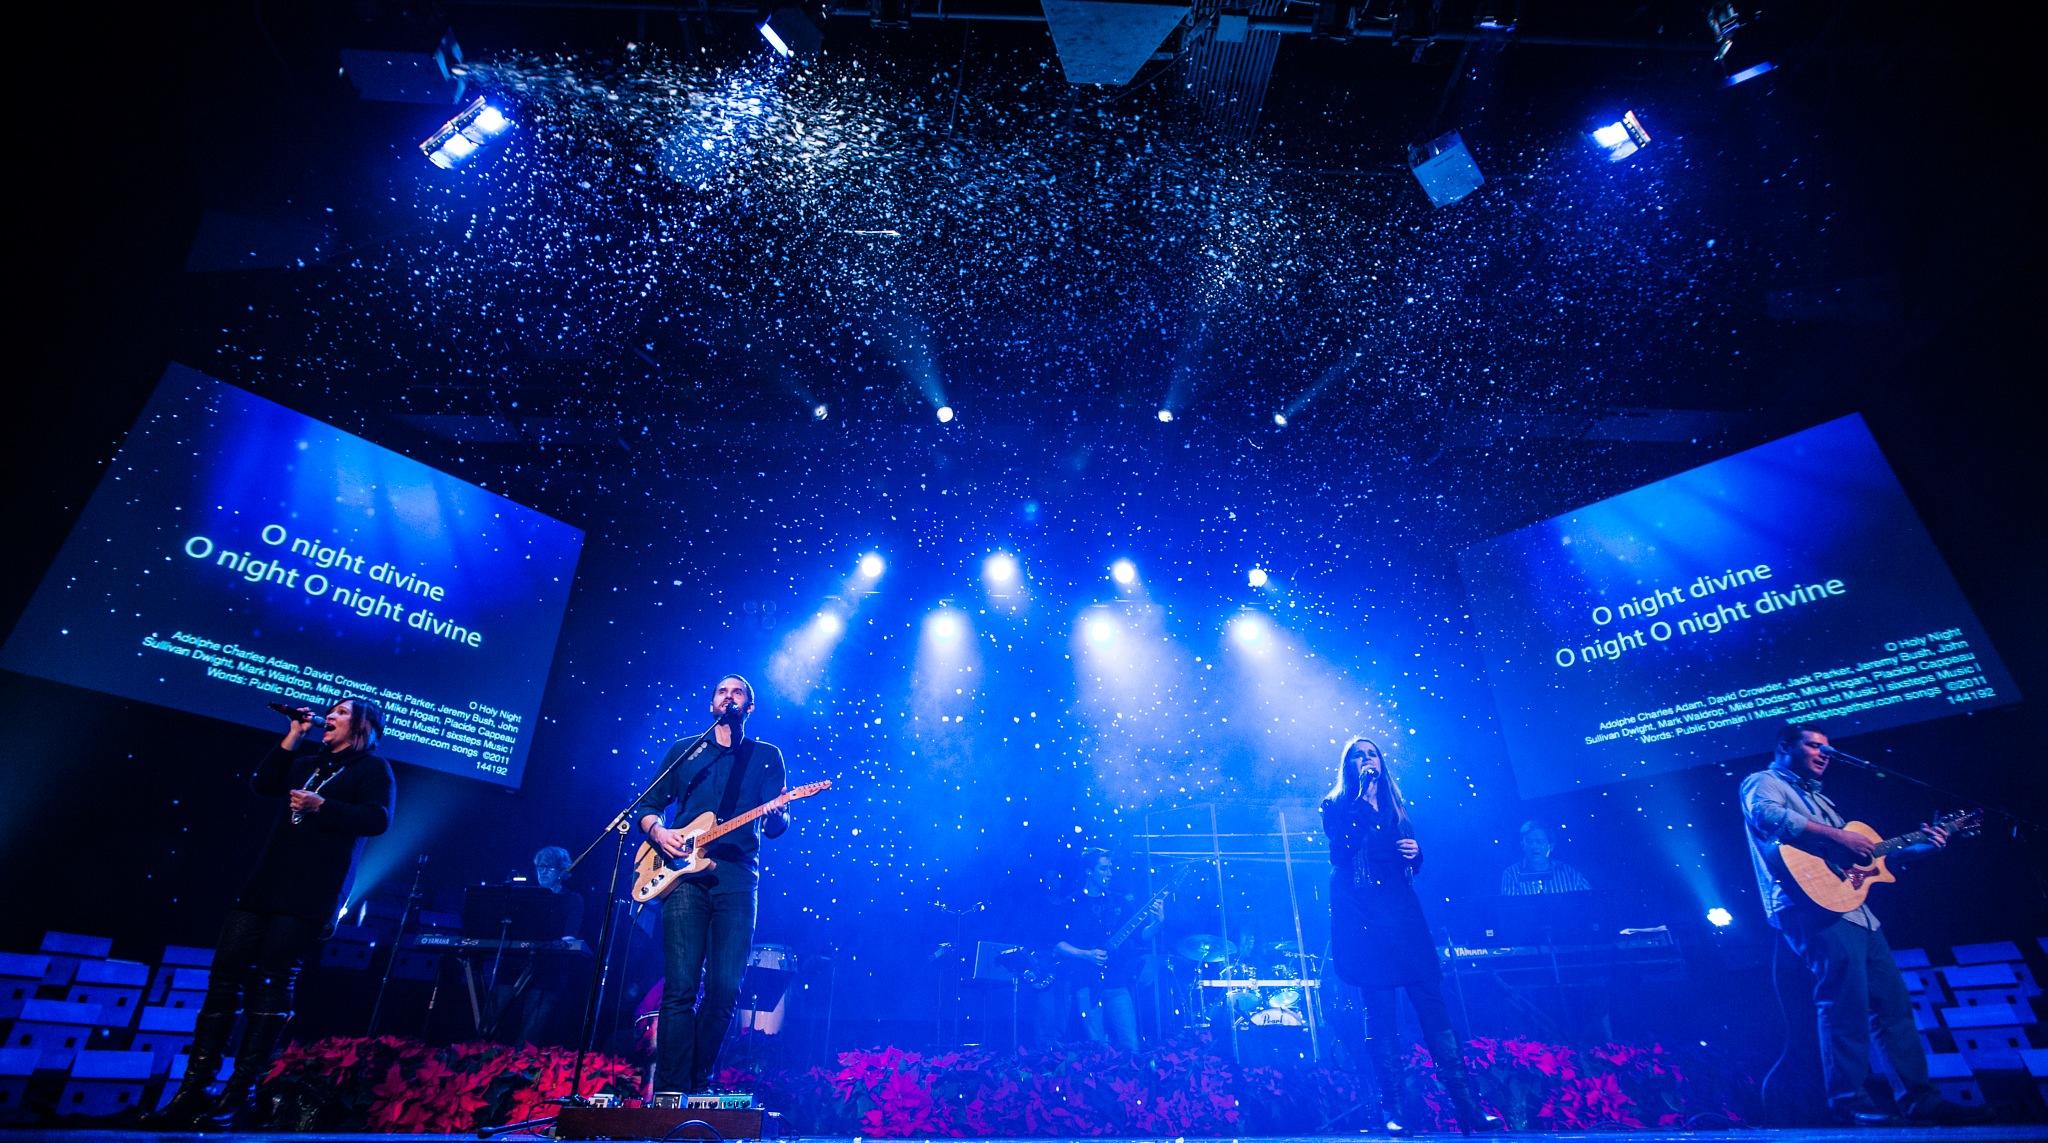 Christmas 2013 by Conrad Weaver